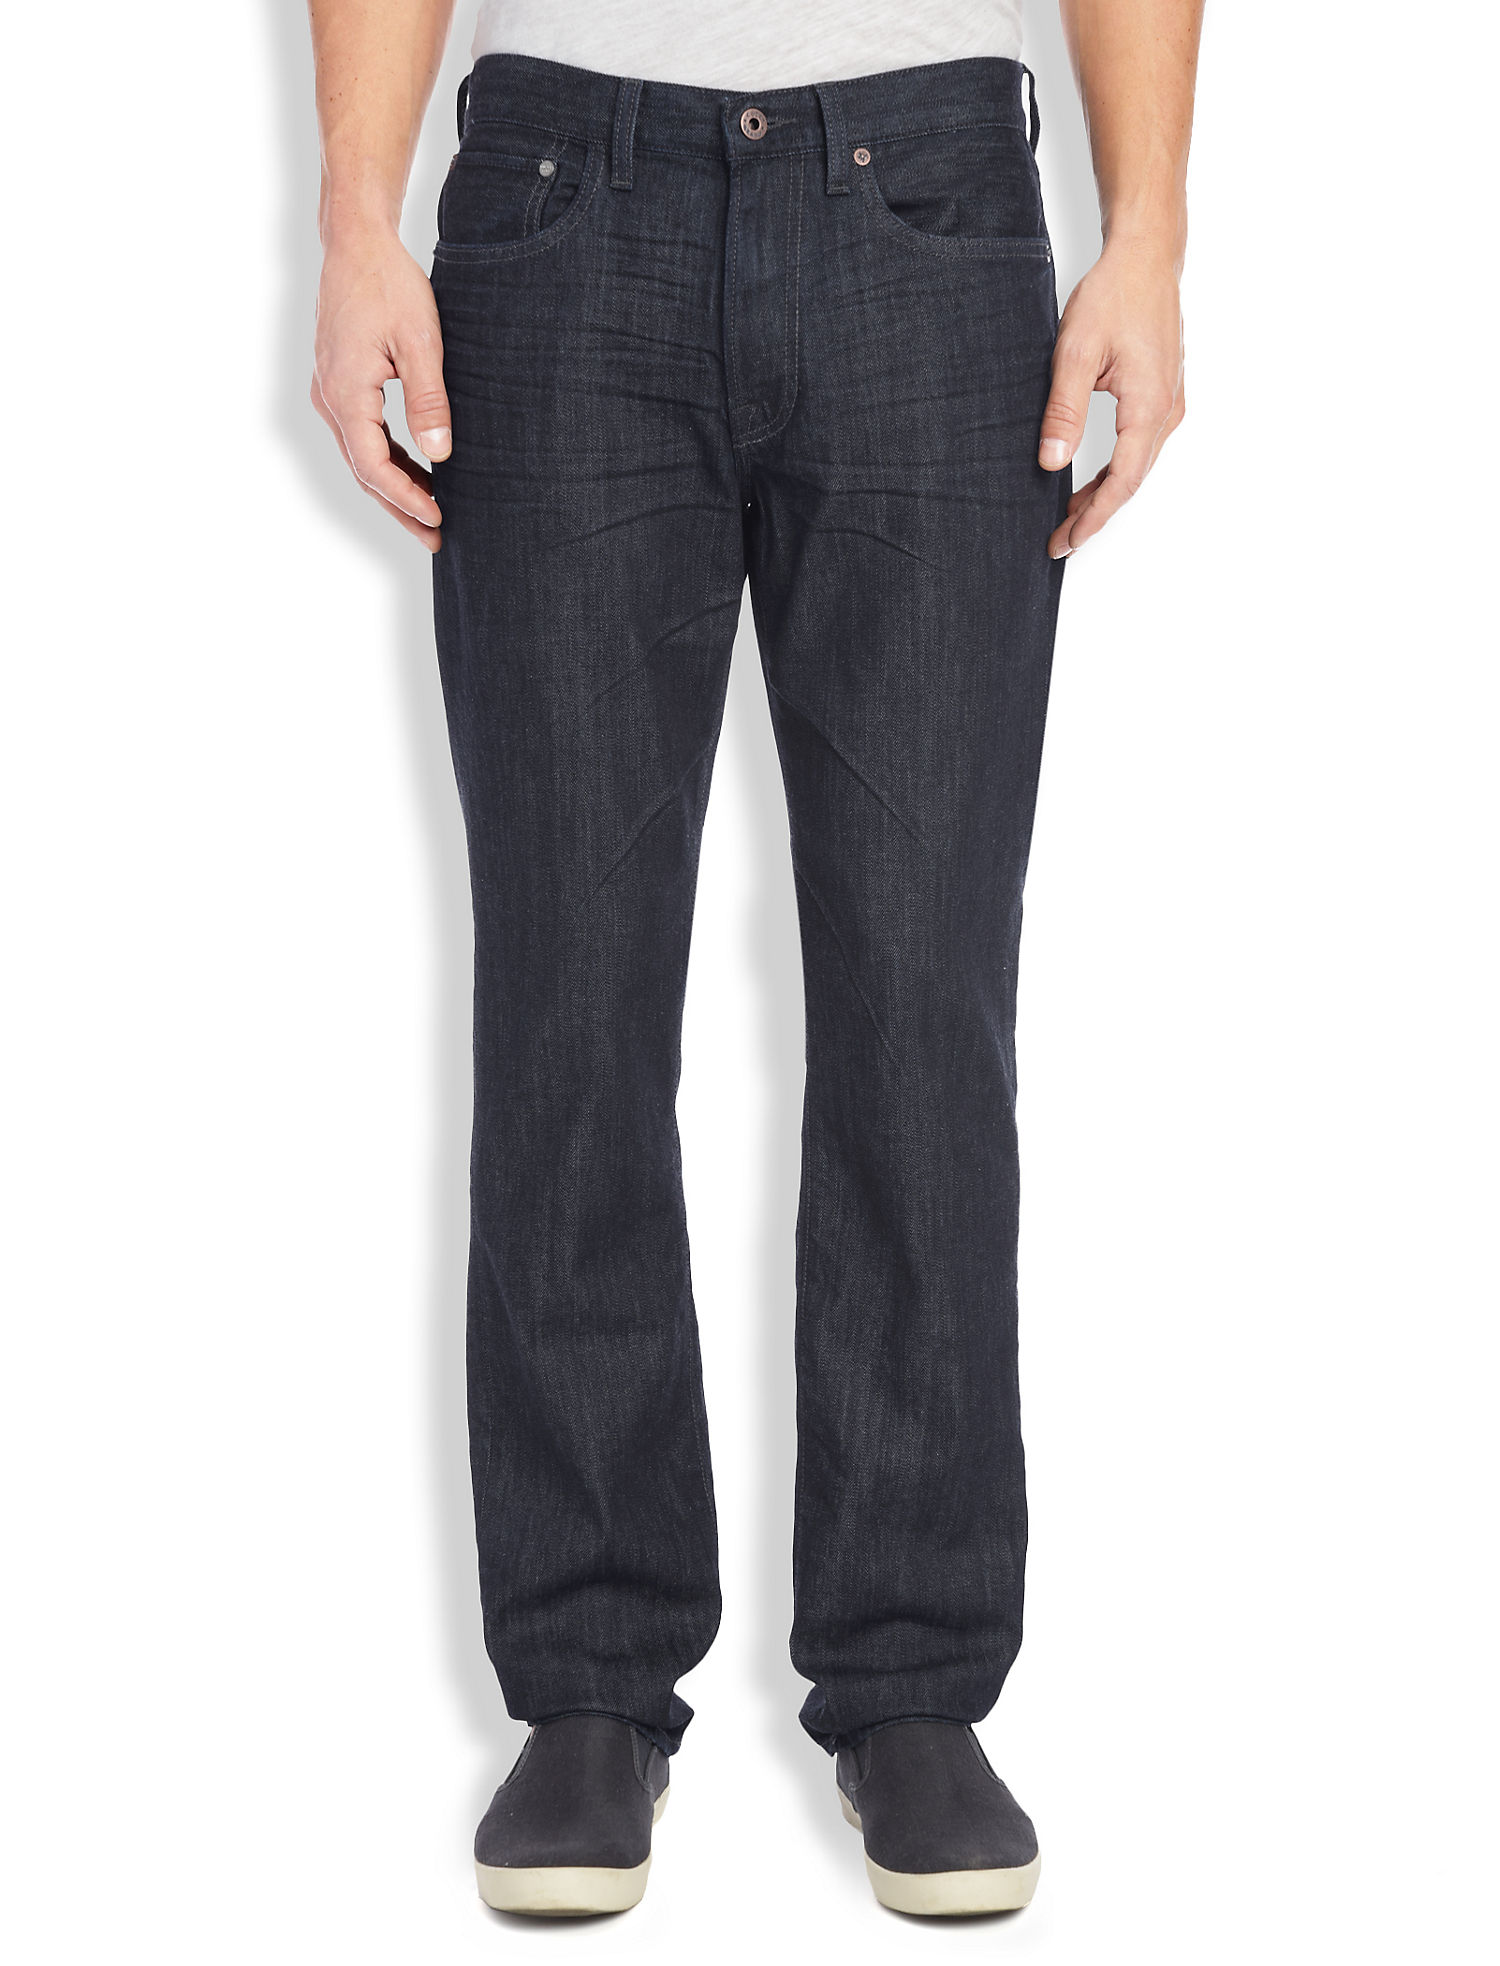 121 Heritage Slim Fit Jeans